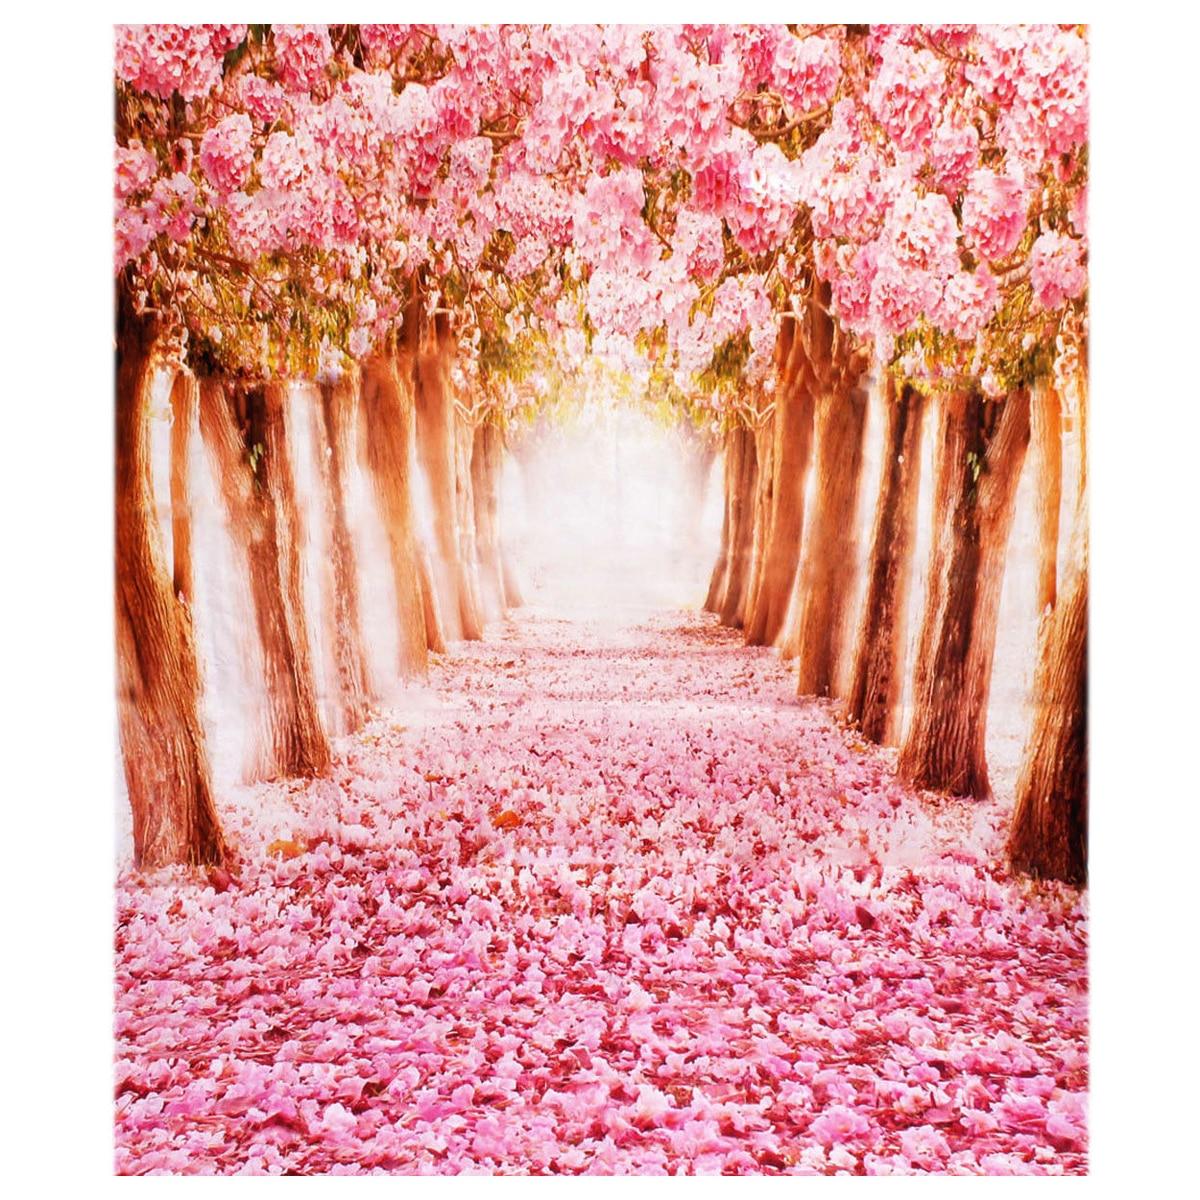 EDT-2*1.5m Fantastic Pink Flower Street Studio Photography Props Backdrop Background cigar m edt